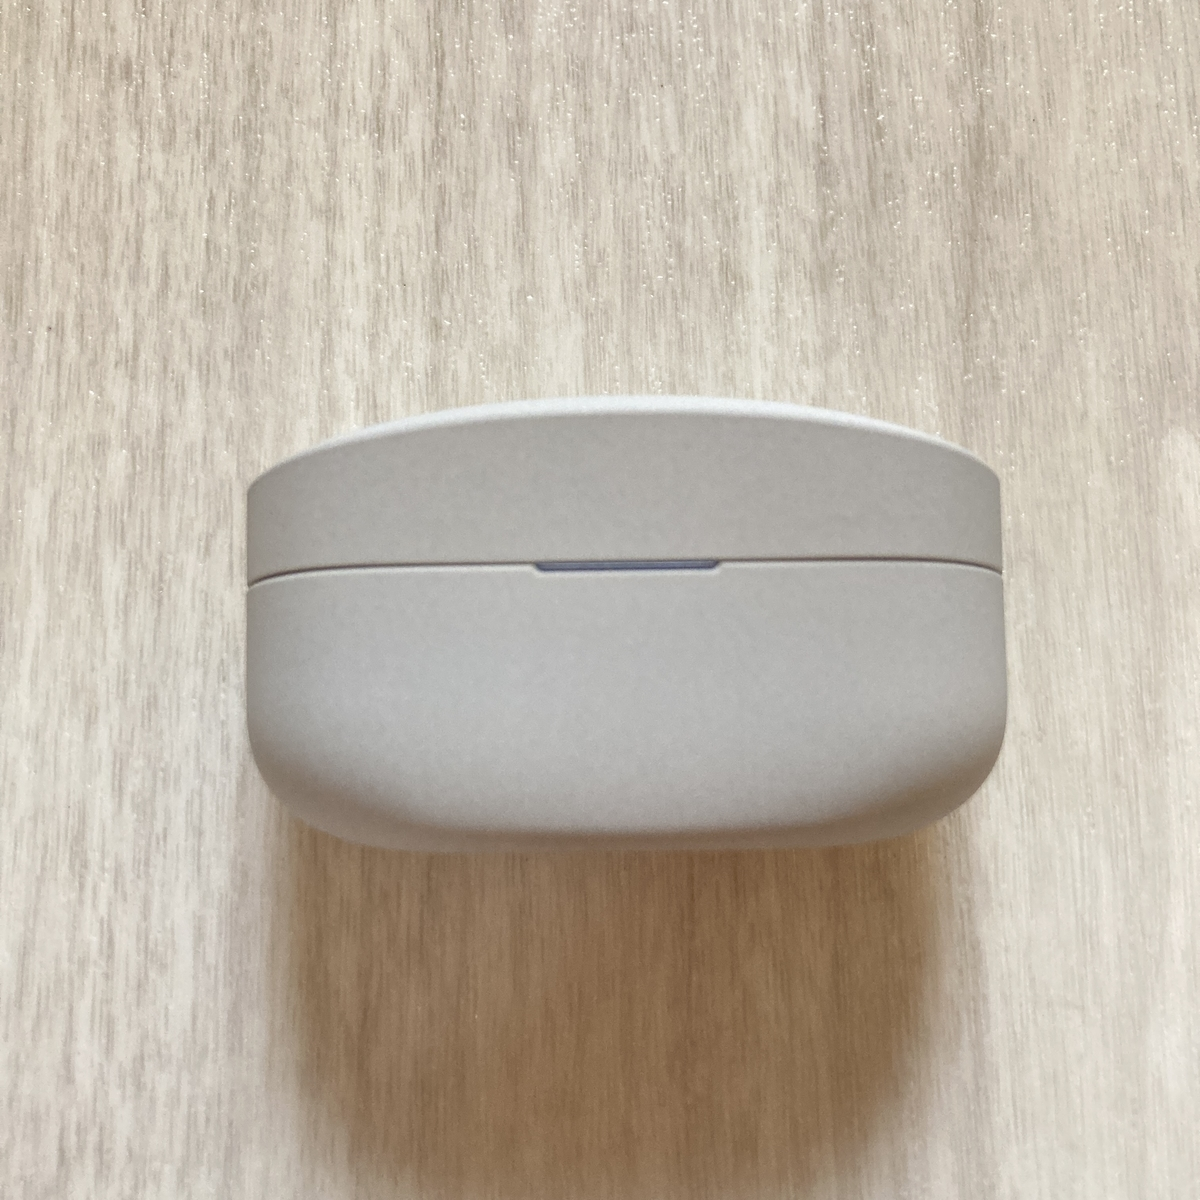 Sony WF-1000XM4 完全ワイヤレスイヤホン WF-1000XM3 Bluetooth イヤホン ヘッドホン SBC aptx LDAC Apple AirPods Pro